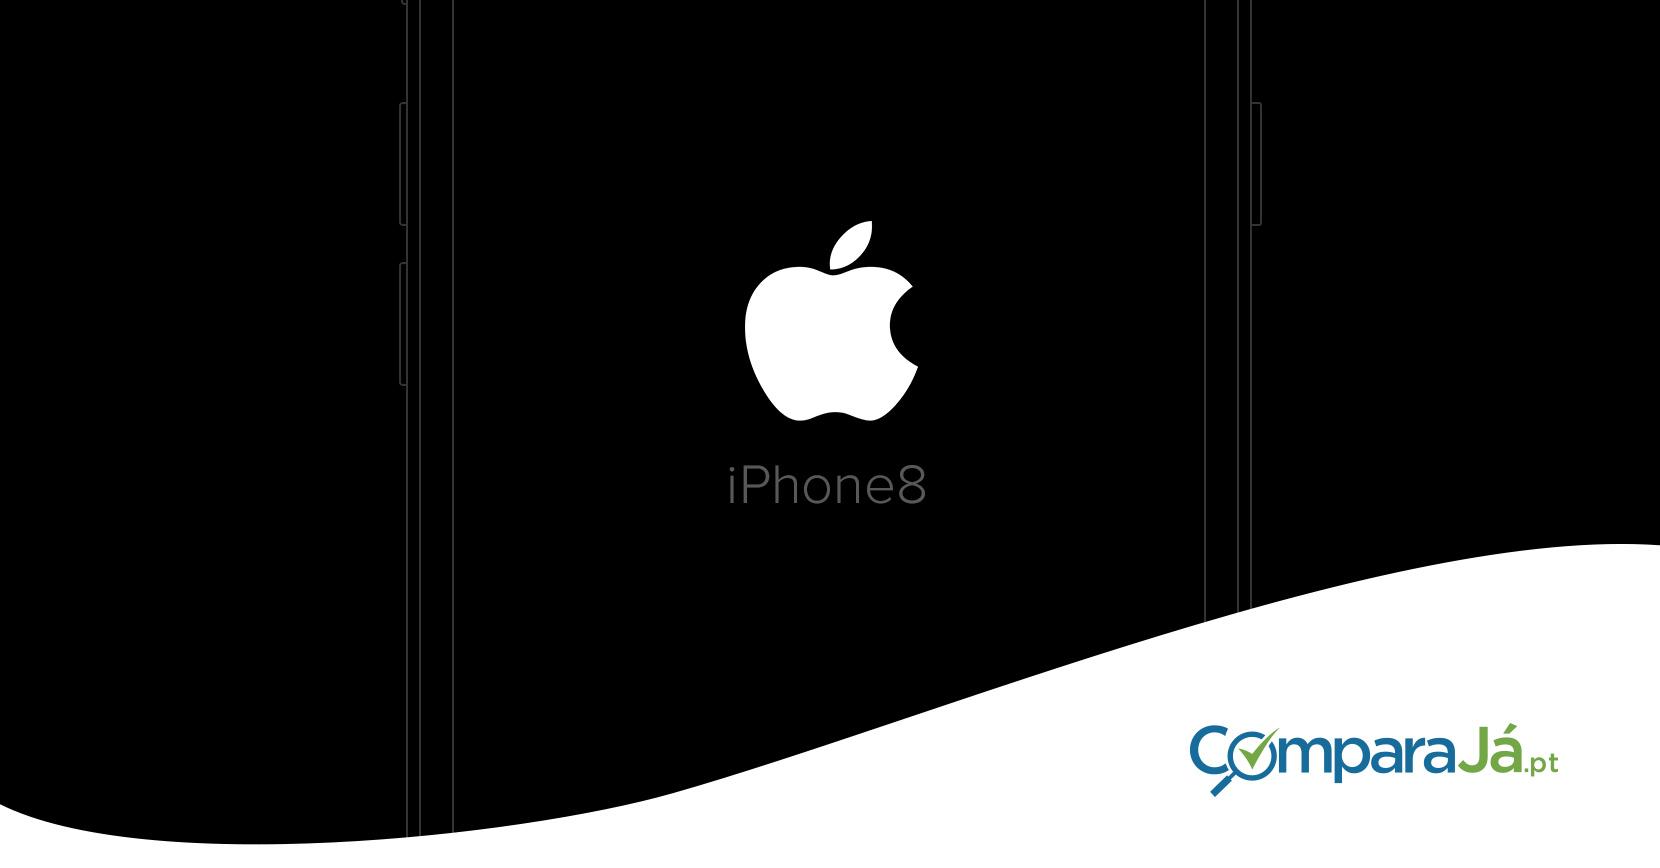 iPhone 8 Tudo o que se sabe até agora